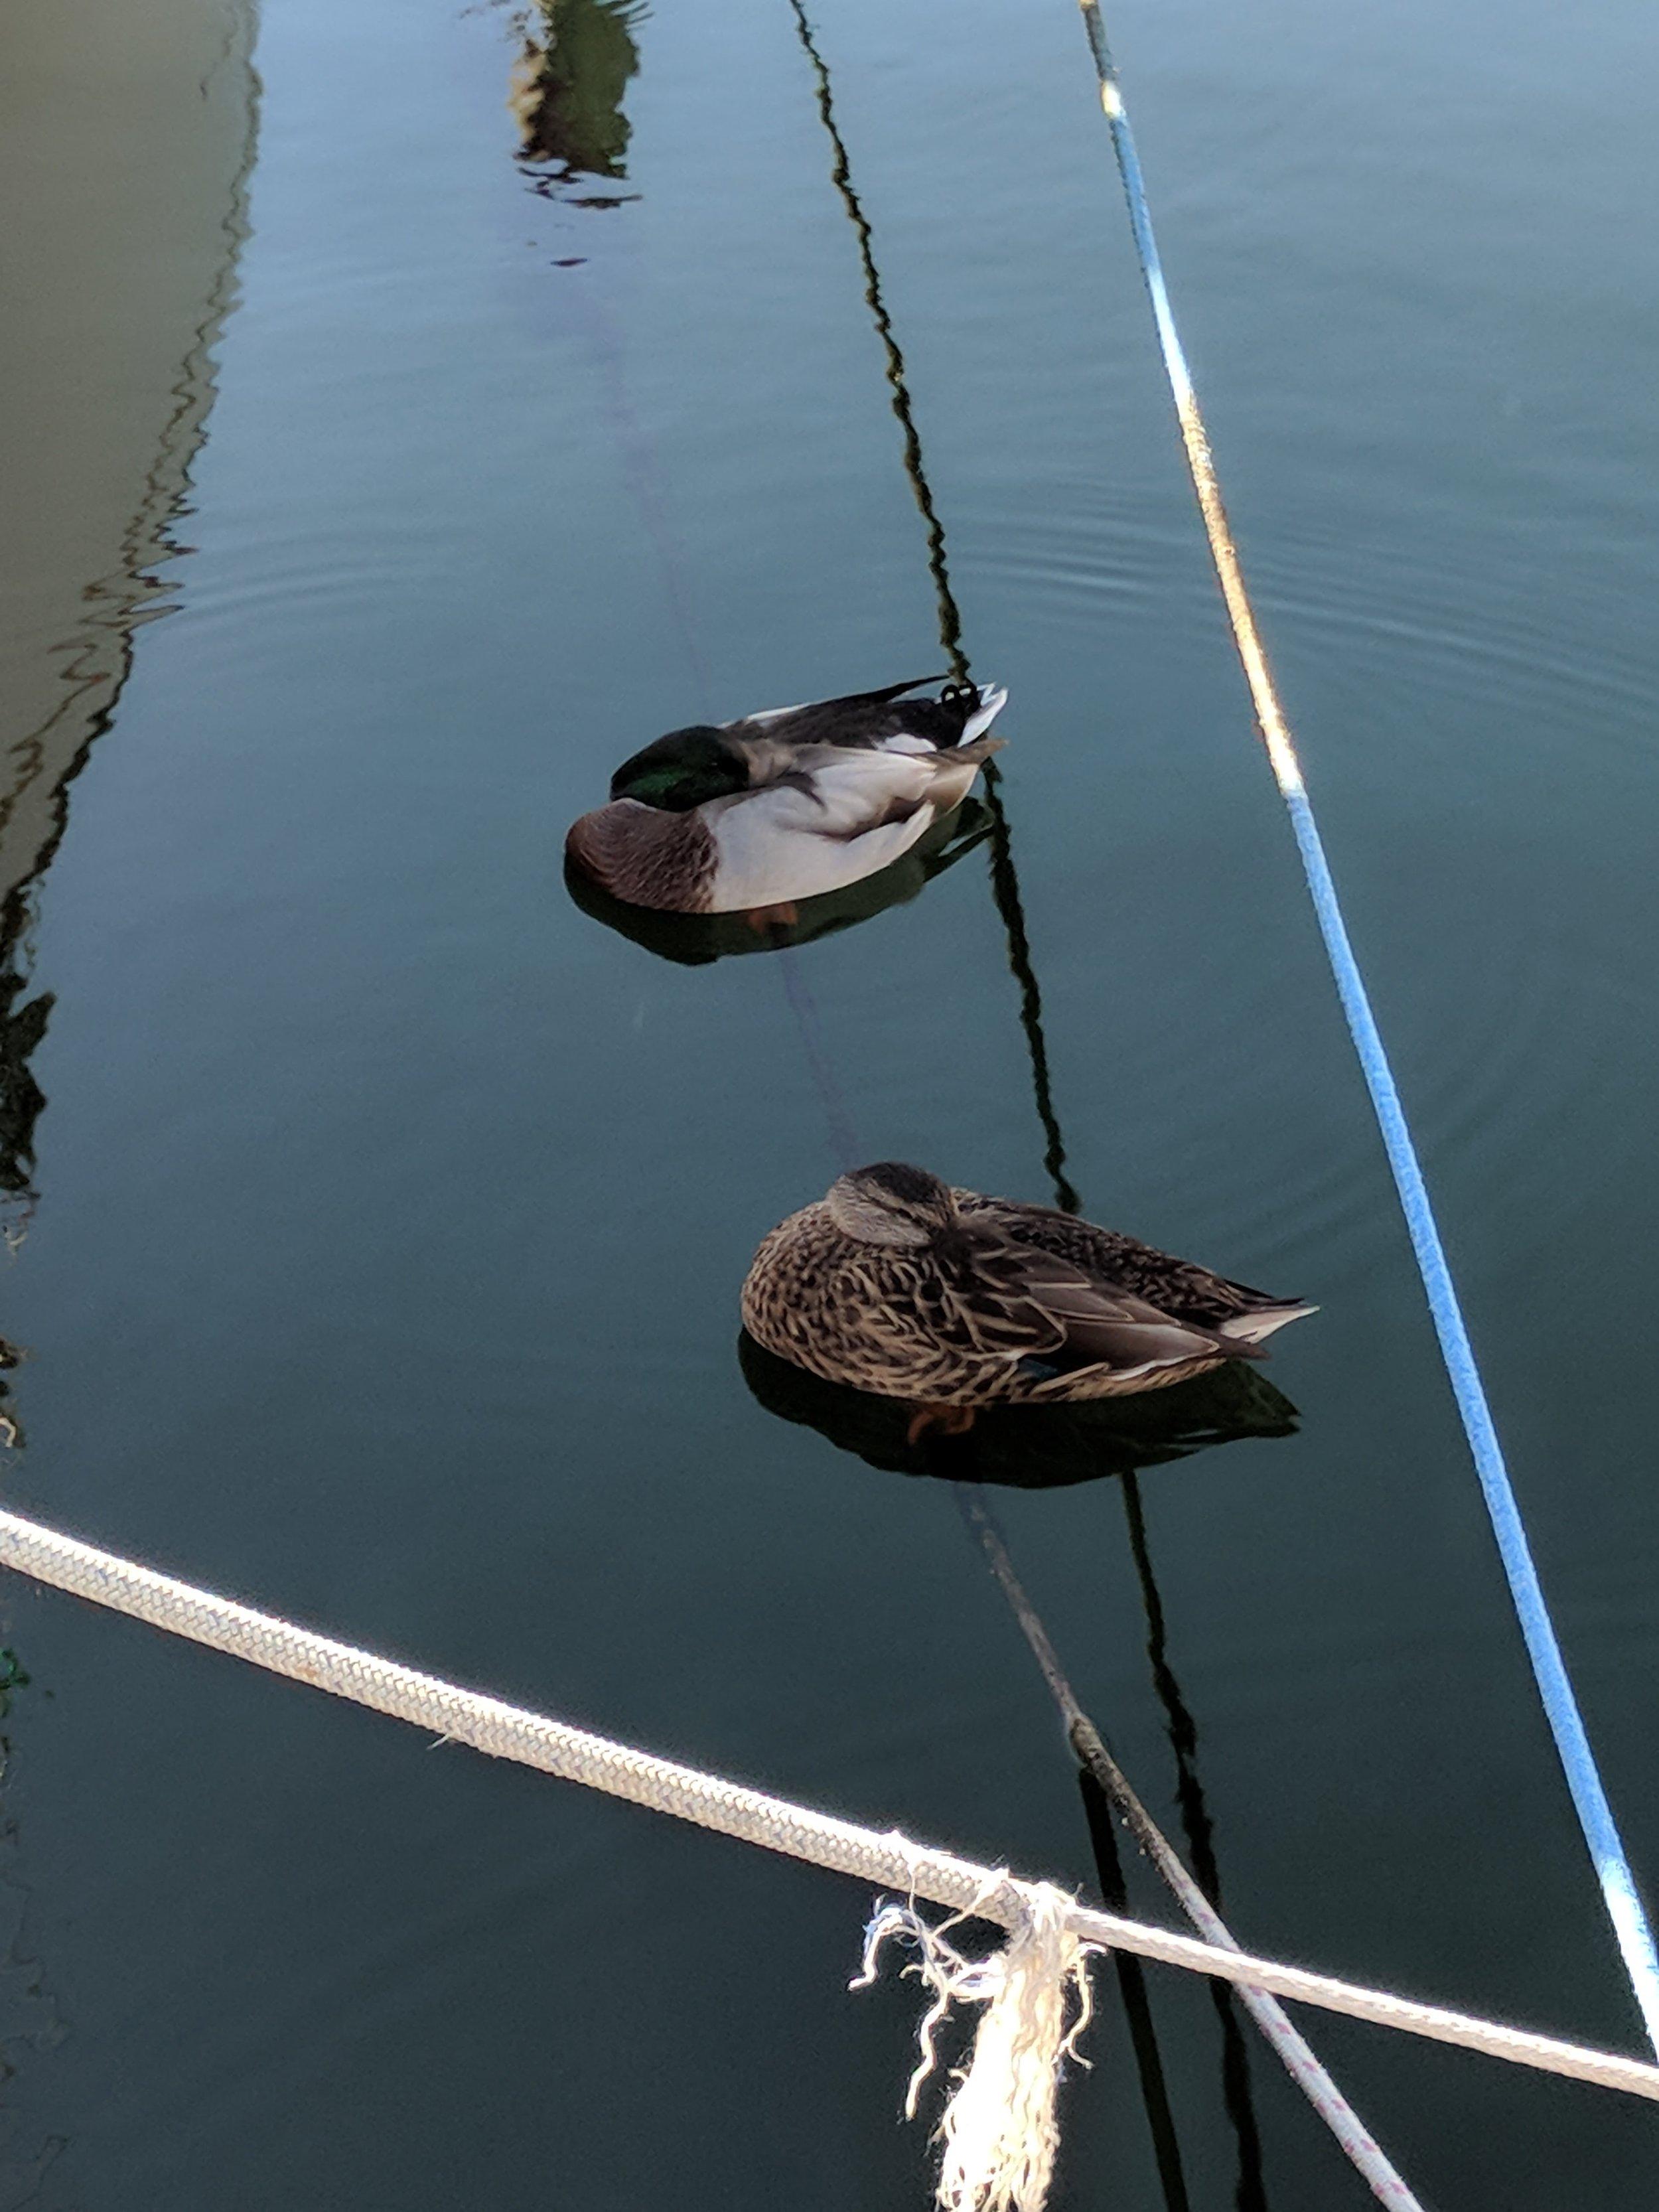 Ducks sleeping on the water.